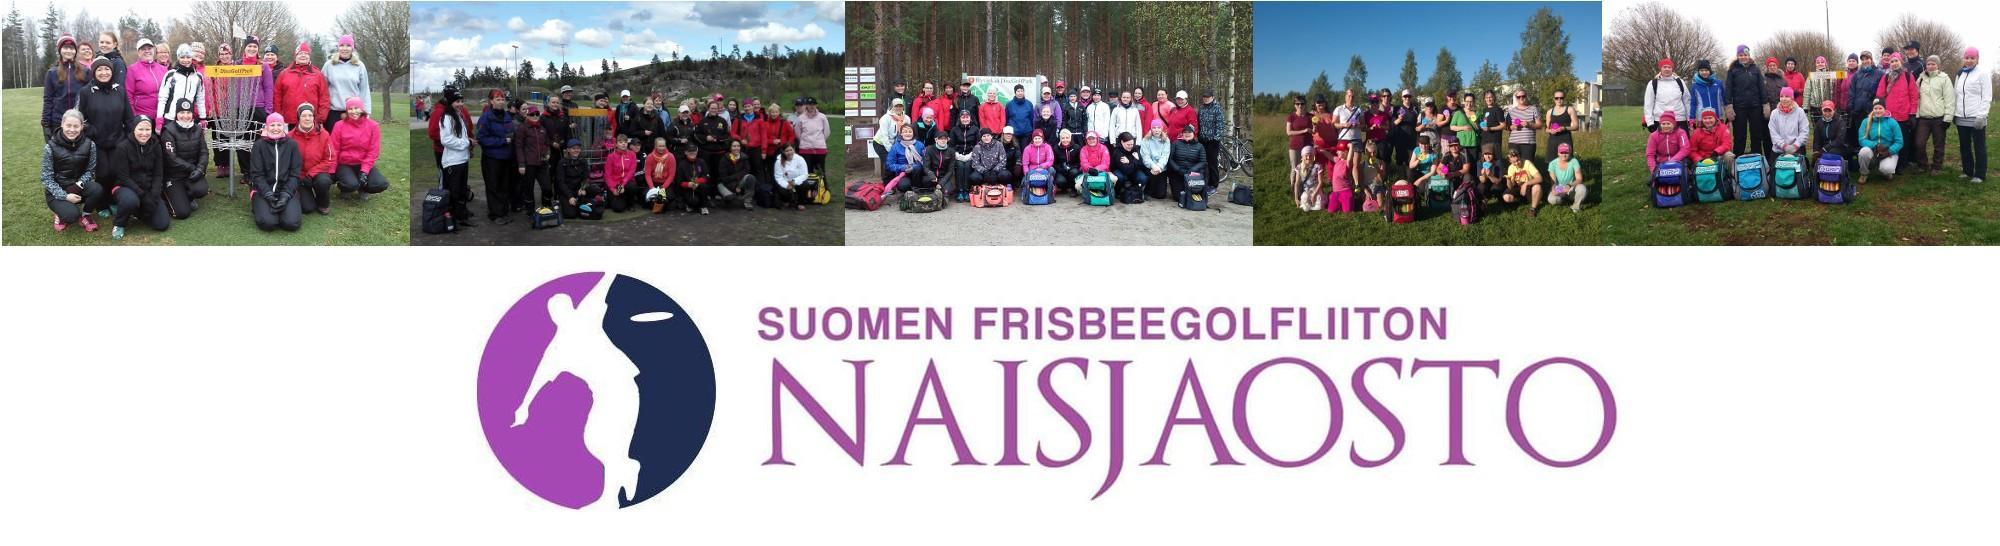 Suomen frisbeegolfliiton naisjaosto